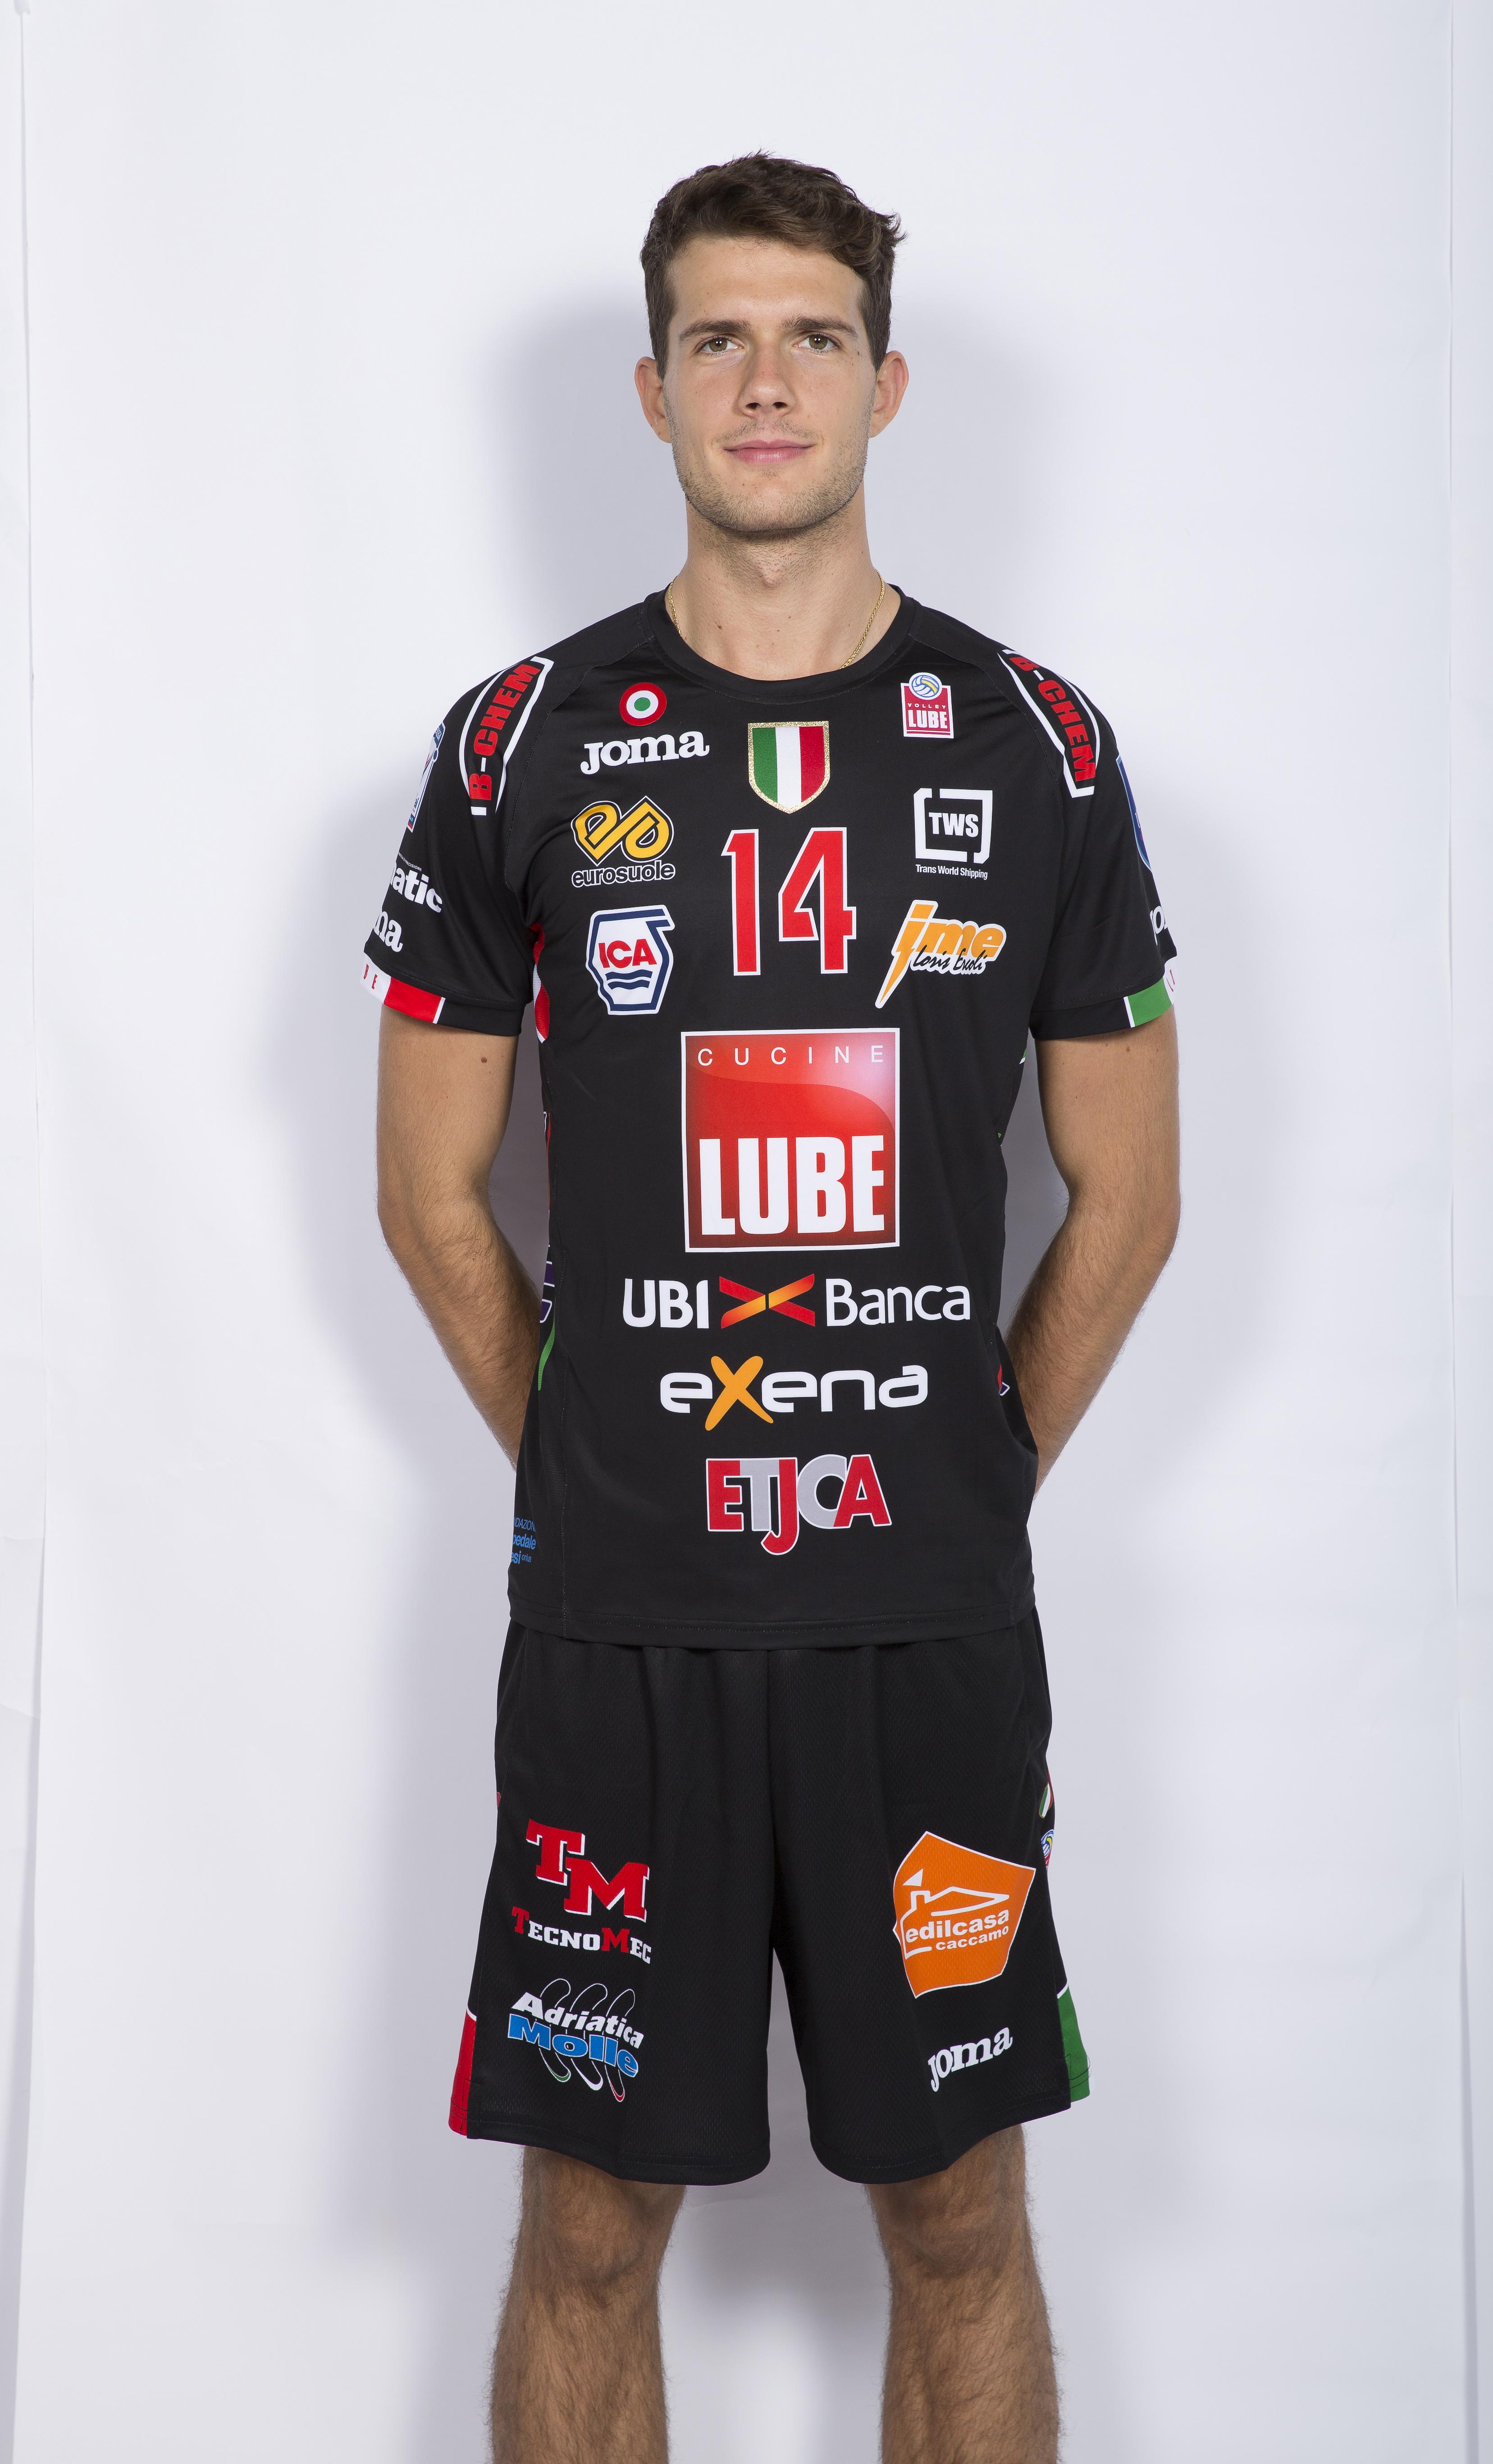 Sebastiano Milan